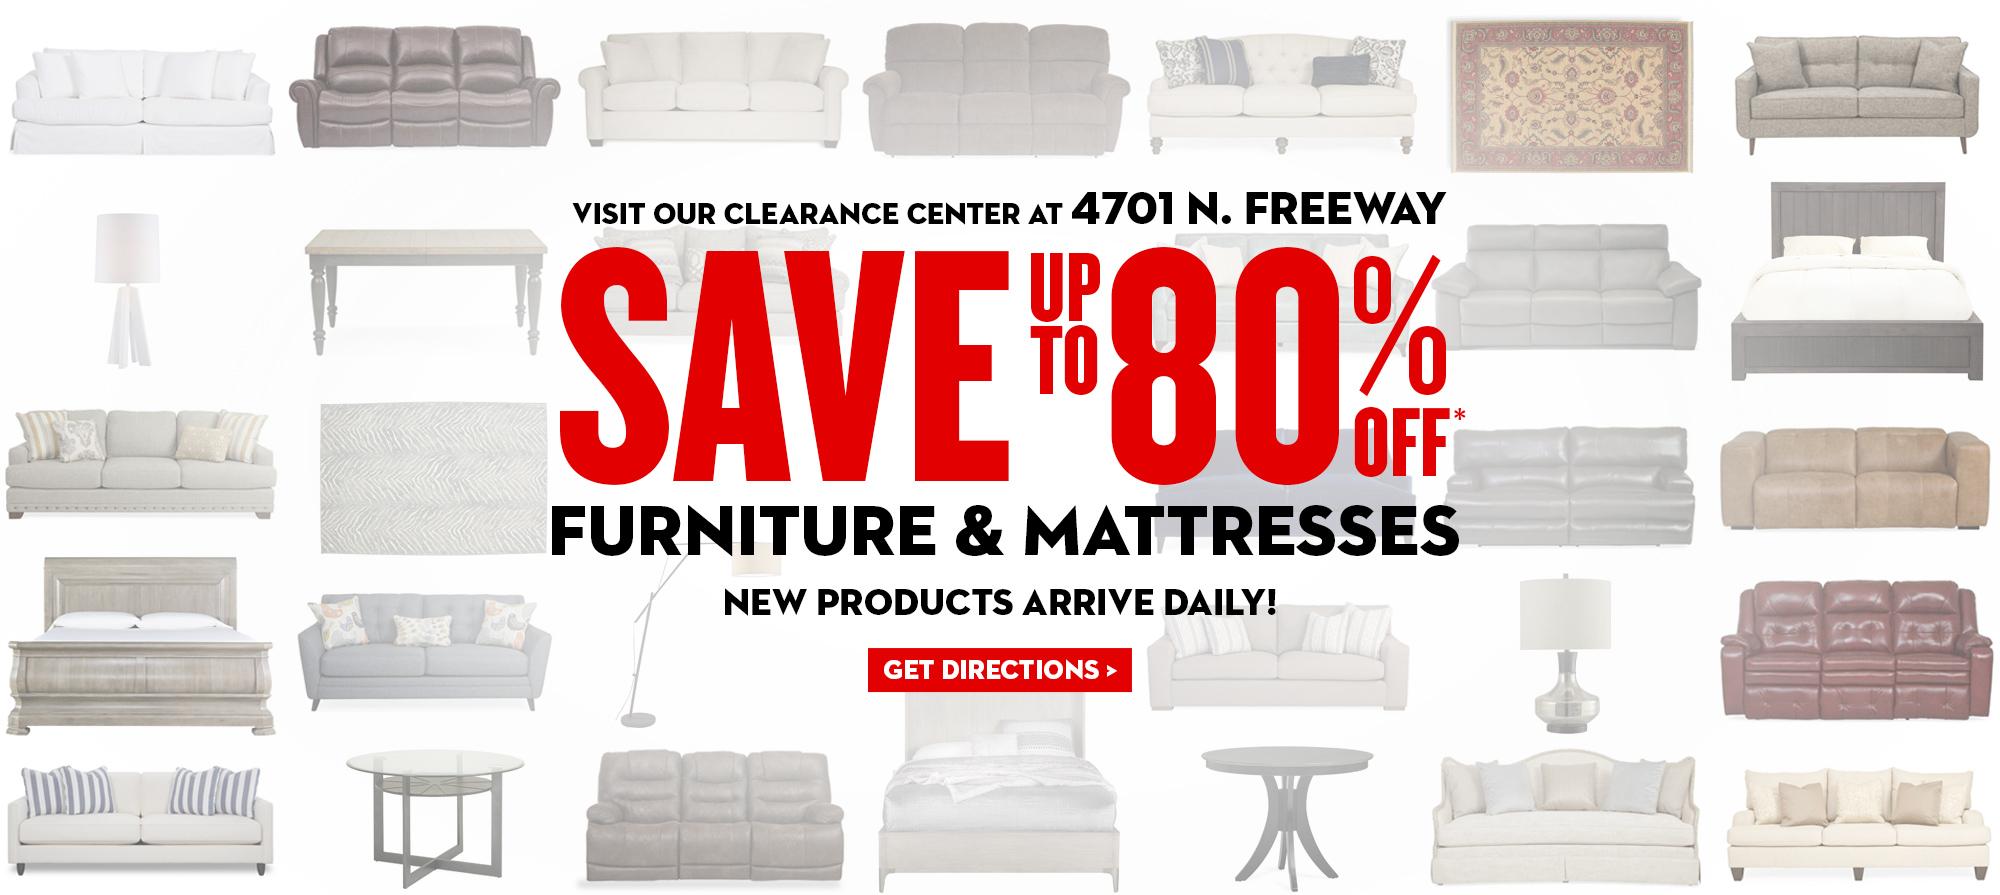 Quality Furniture Mattresses Amp Home Decor Star Furniture